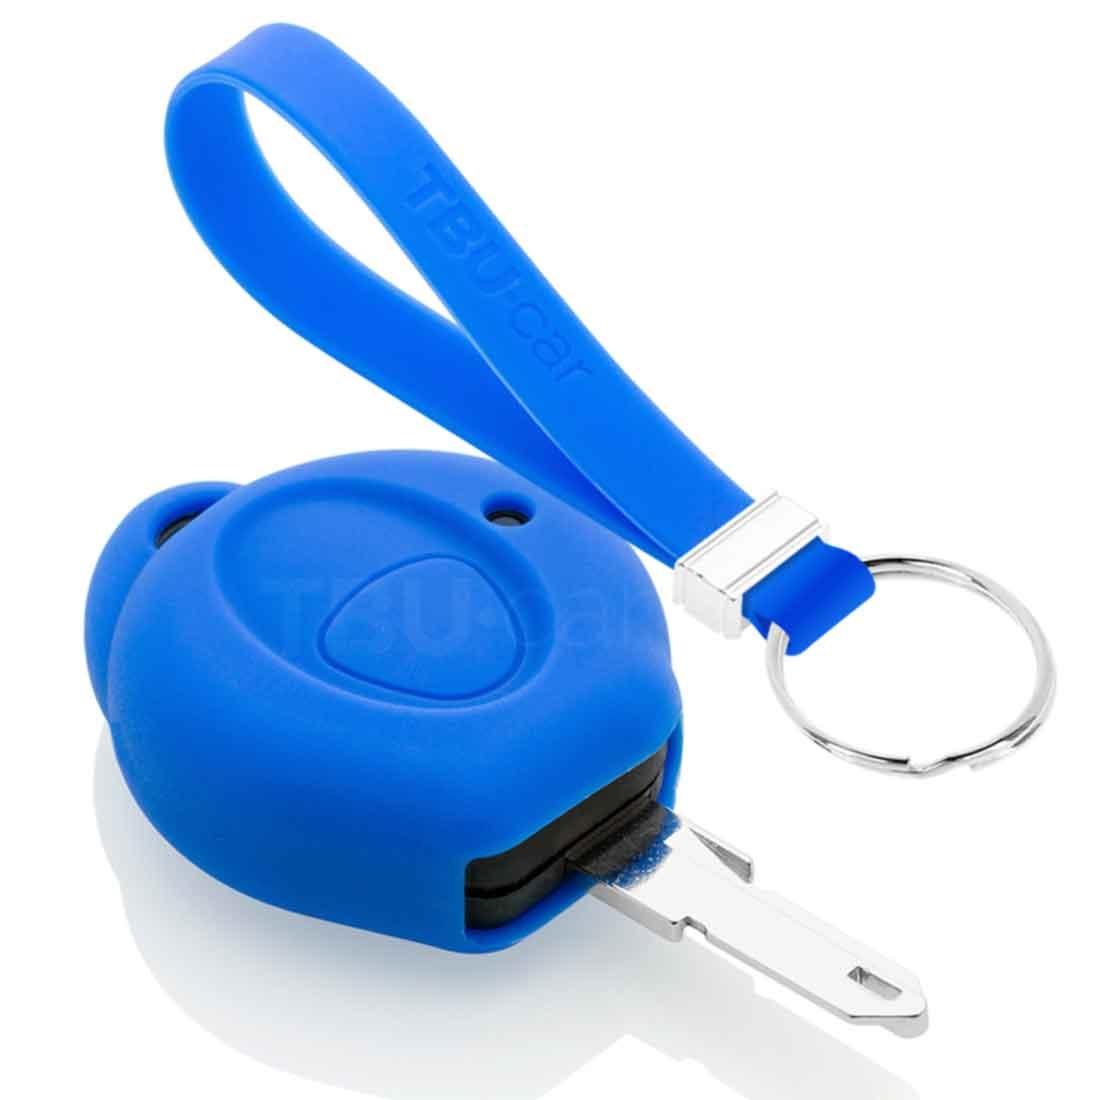 TBU car TBU car Autoschlüssel Hülle kompatibel mit Peugeot 1 Taste - Schutzhülle aus Silikon - Auto Schlüsselhülle Cover in Blau